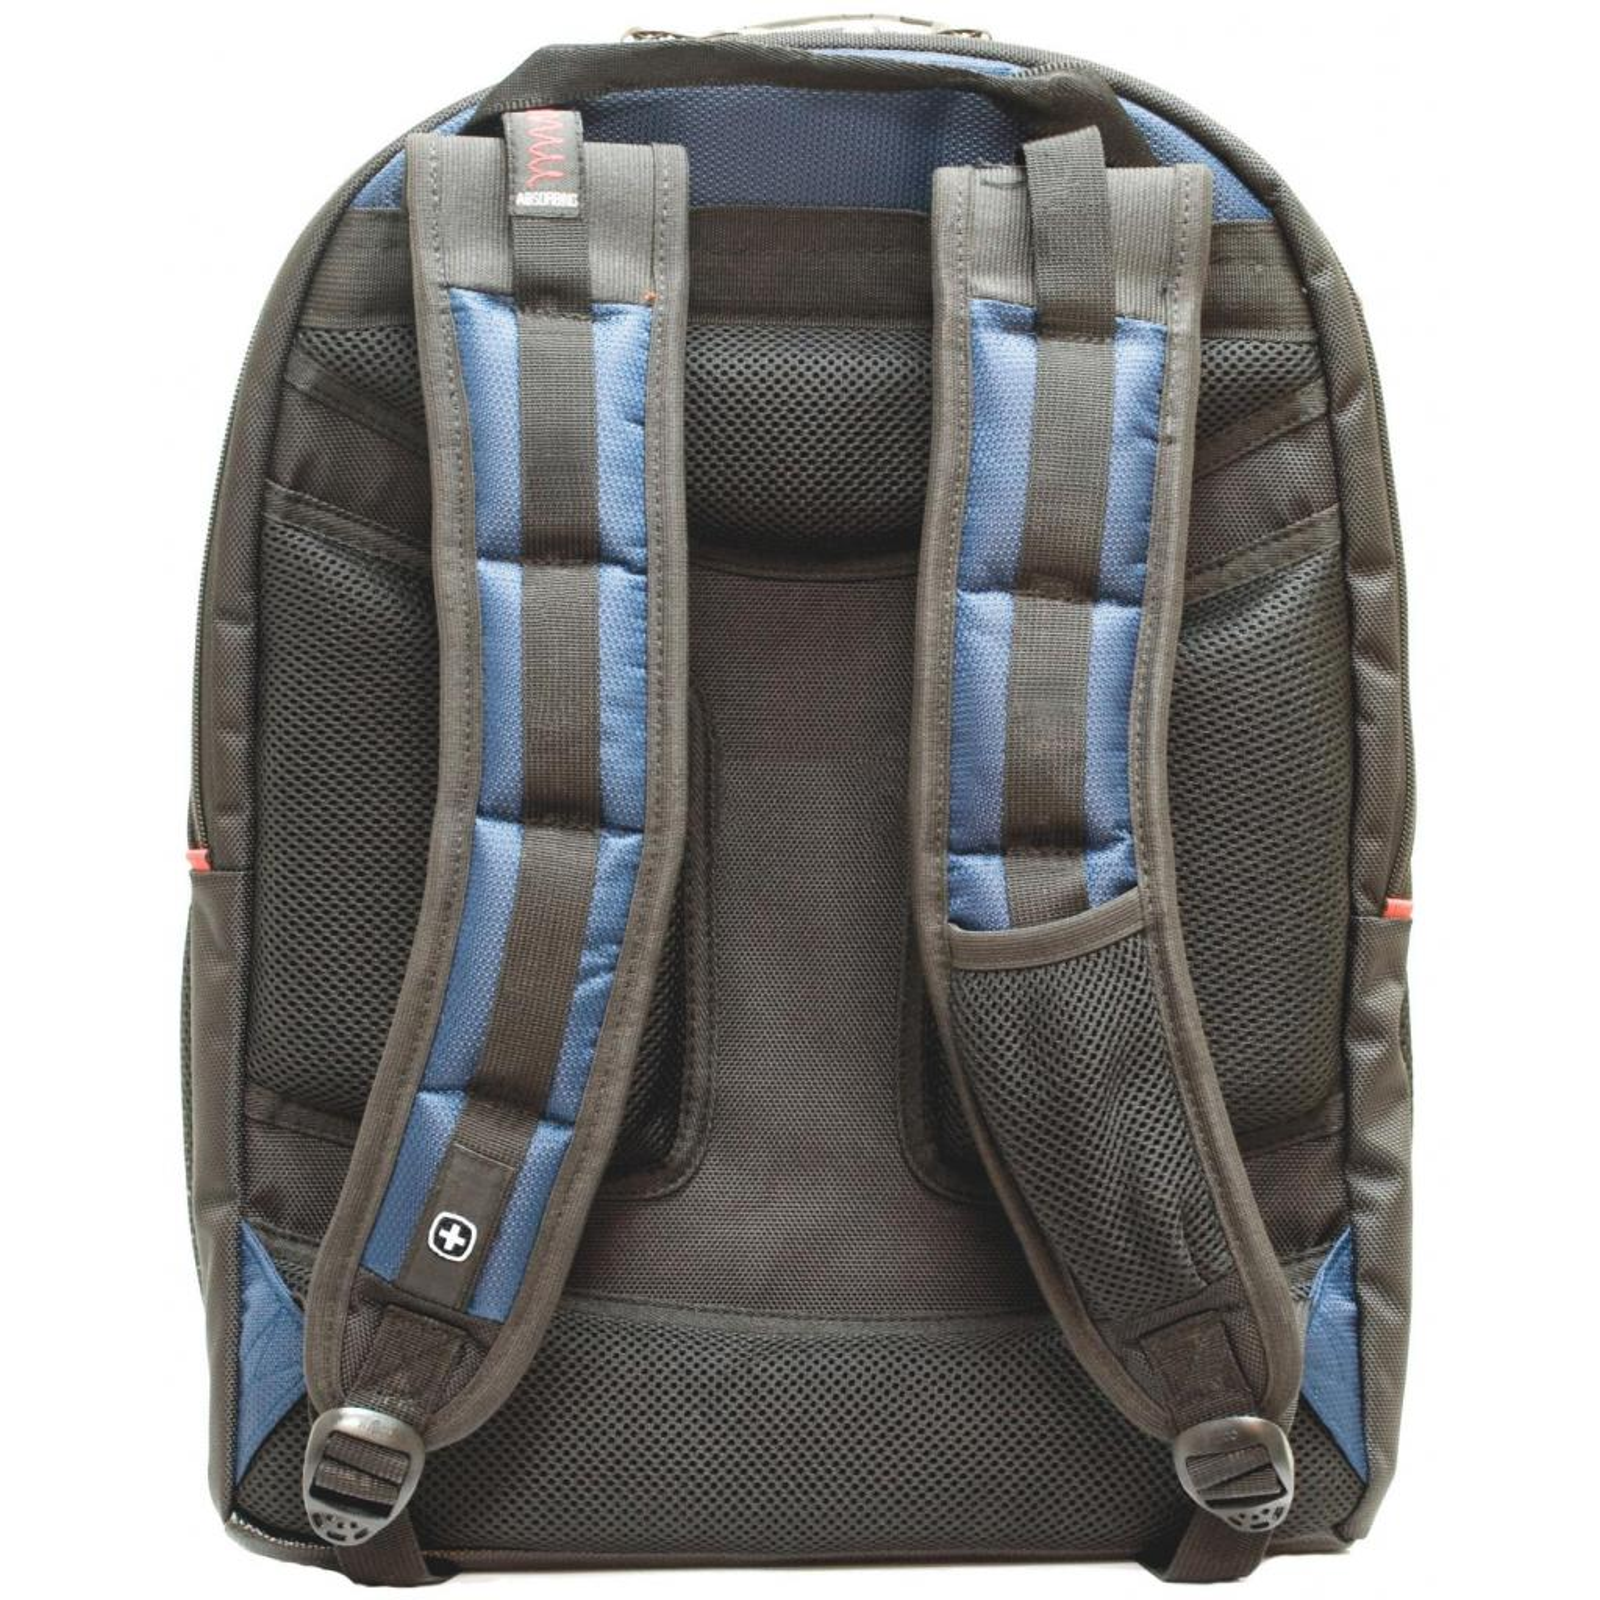 "Рюкзак для ноутбука Wenger 17"" Ibex Black/Blue (600638) изображение 3"